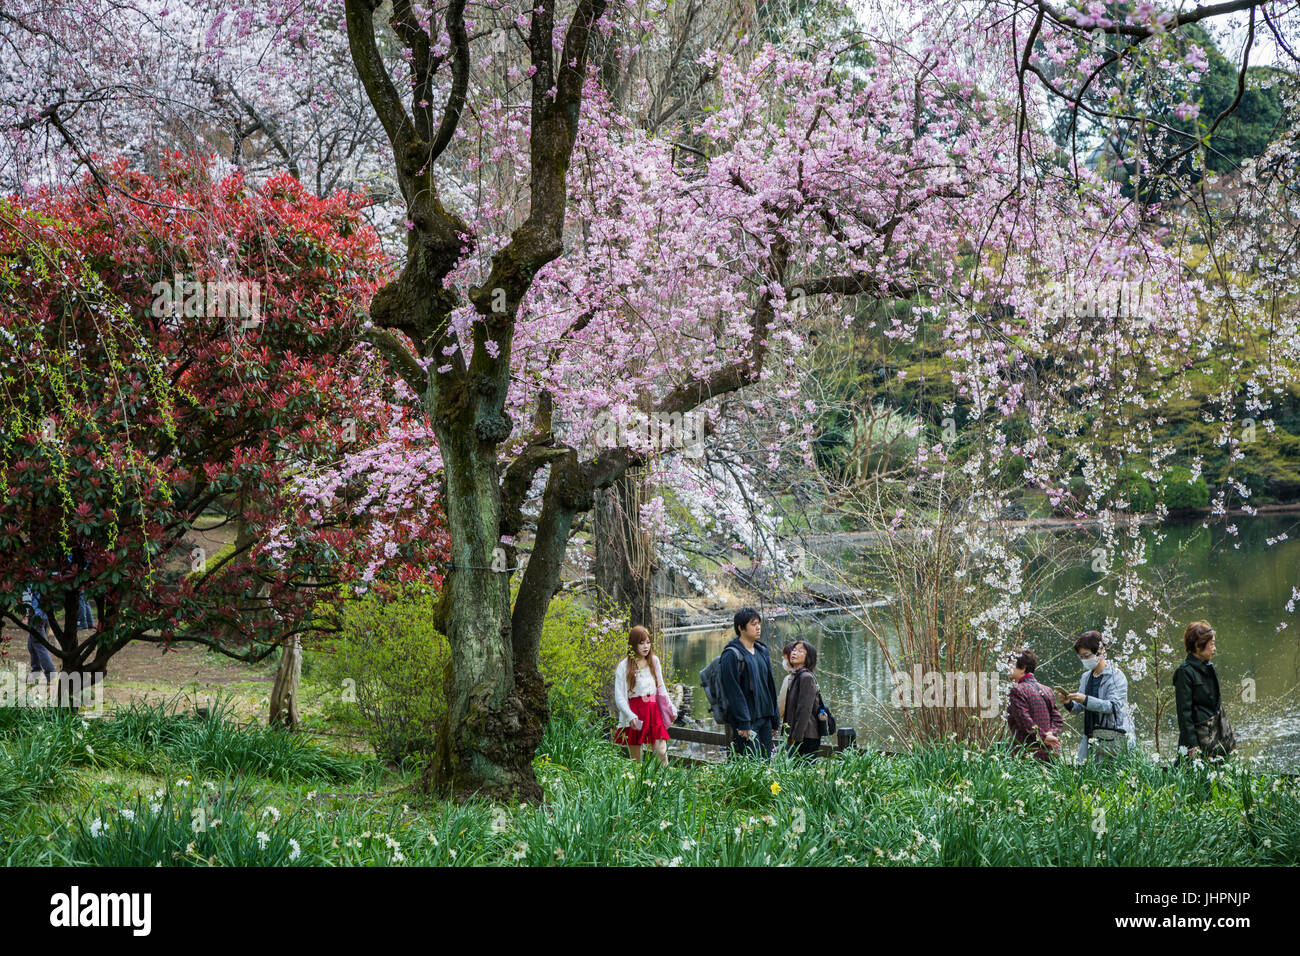 Tourists and sakura cherry blossoms in the Shinjuku Gyoen National Gardens in Tokyo, Japan, Asia. - Stock Image